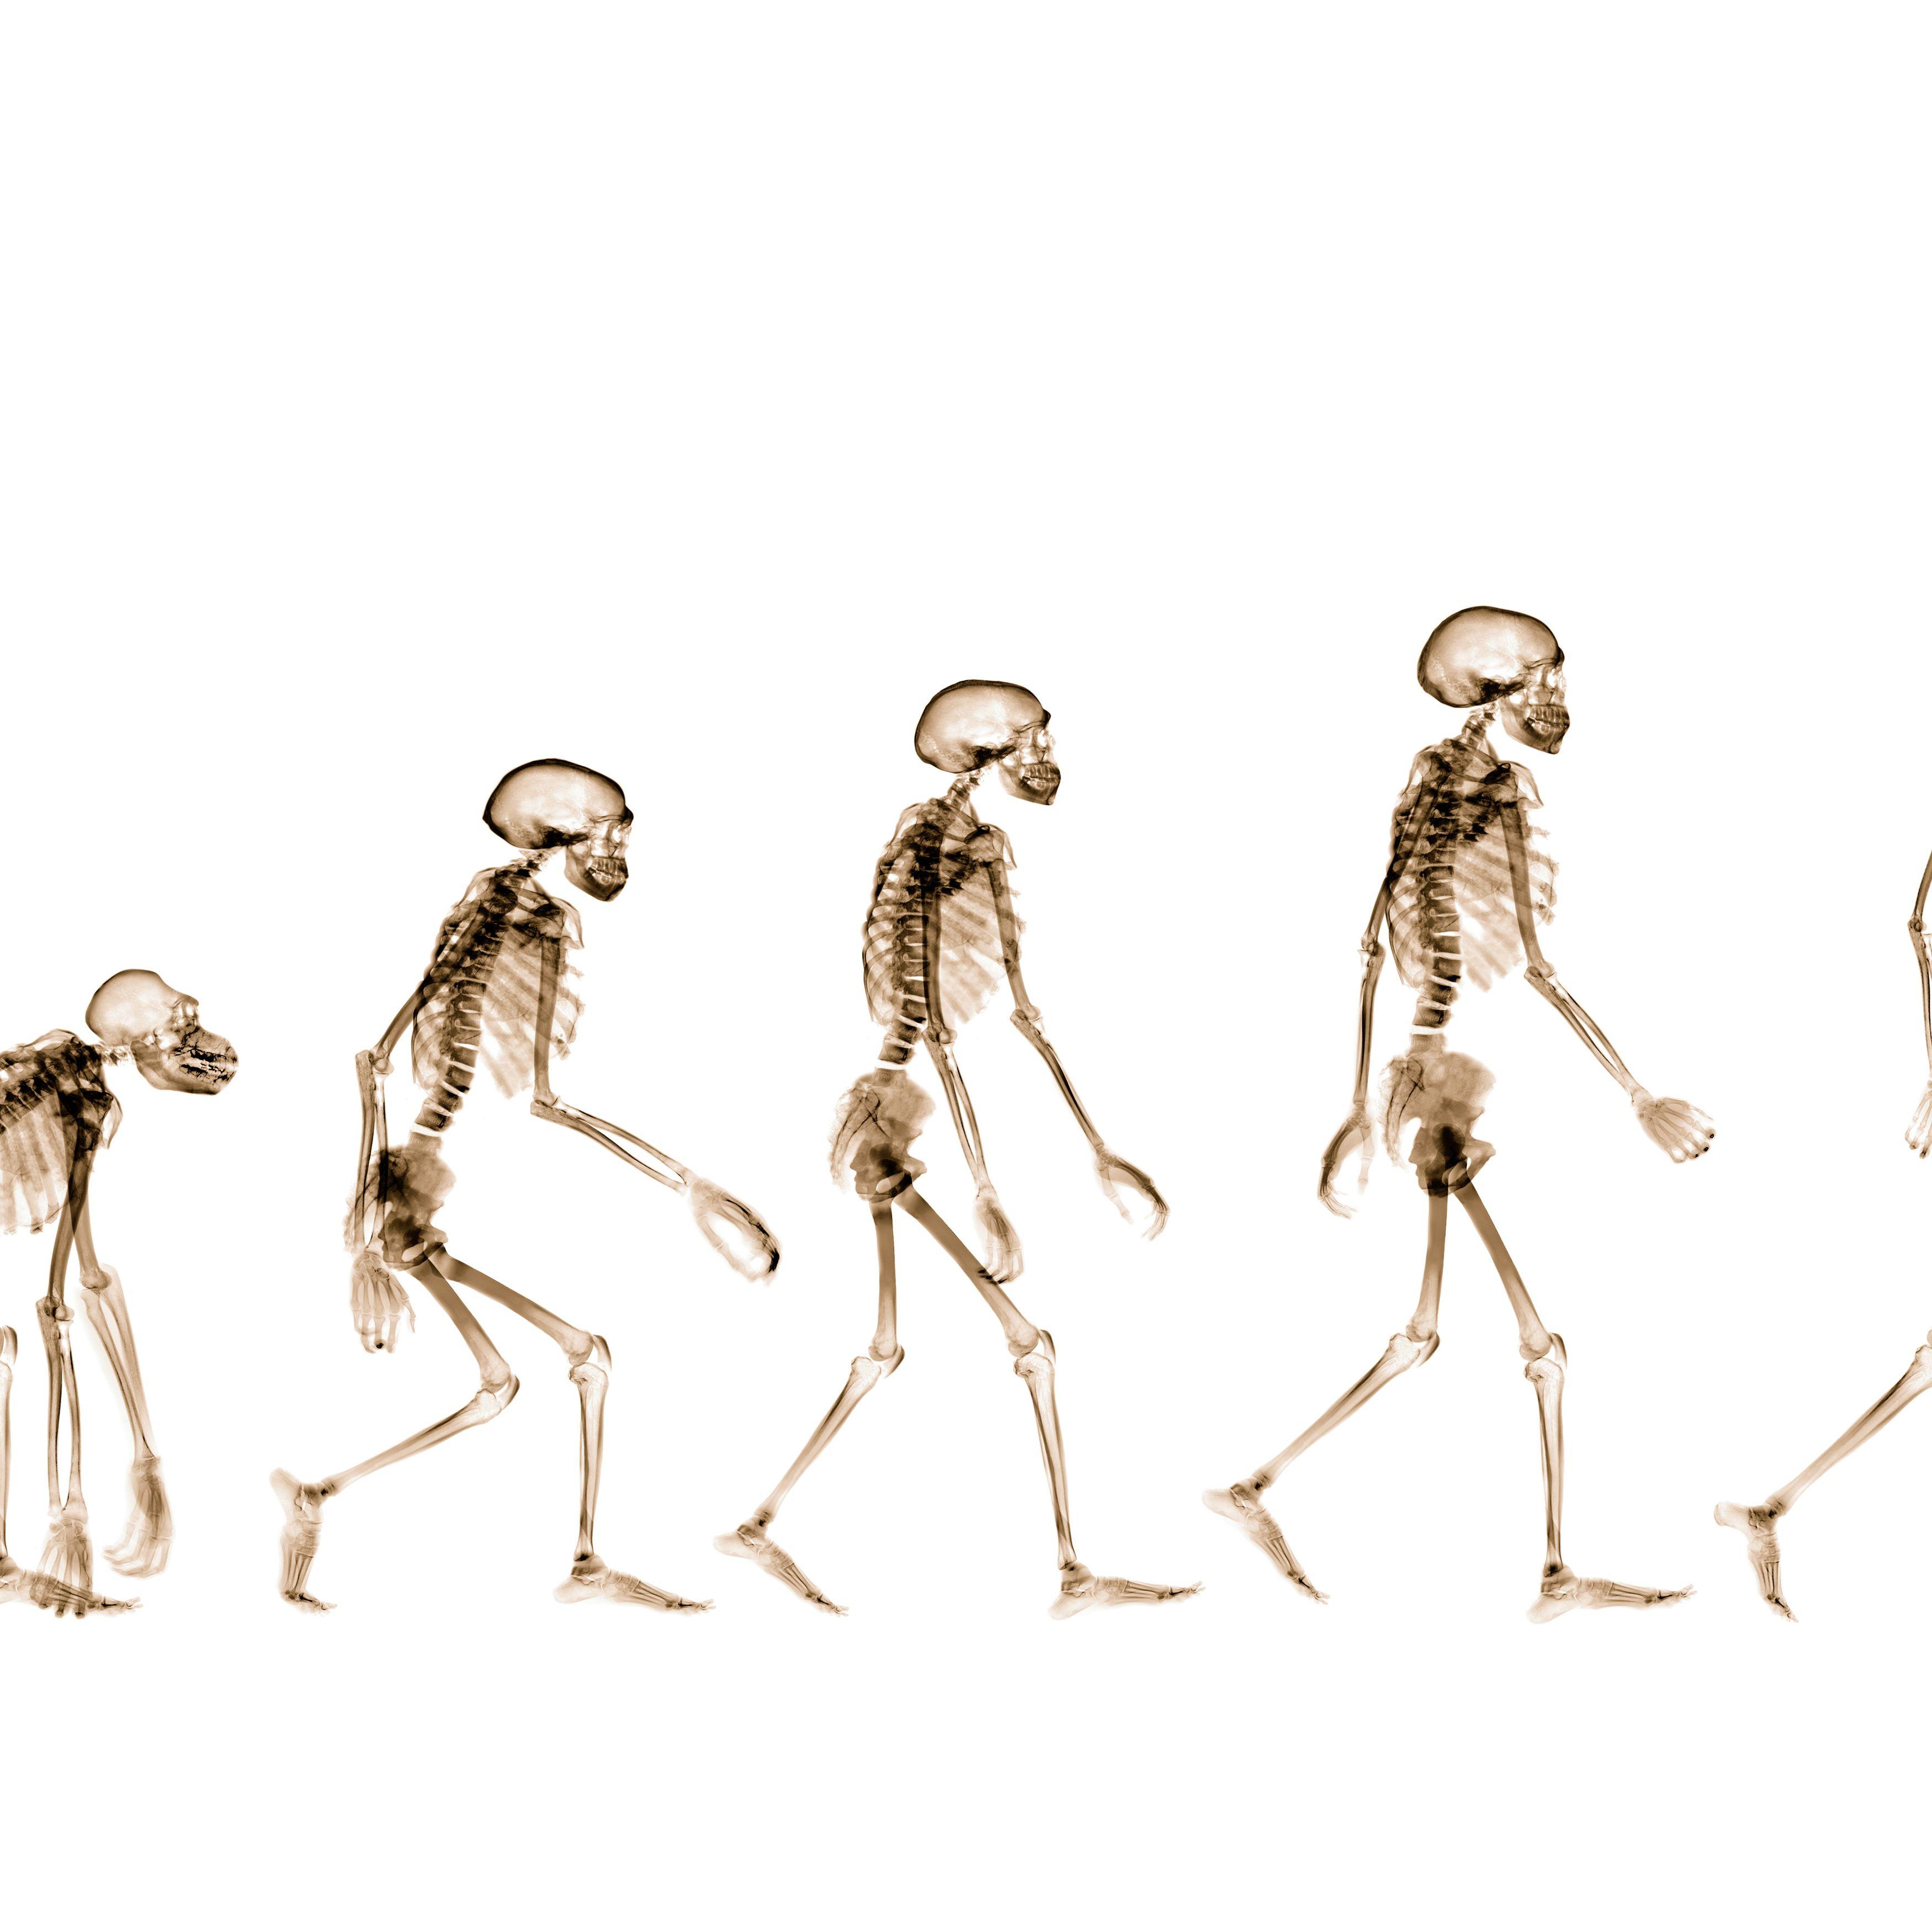 Anatomy Evolution And Homologous Structures